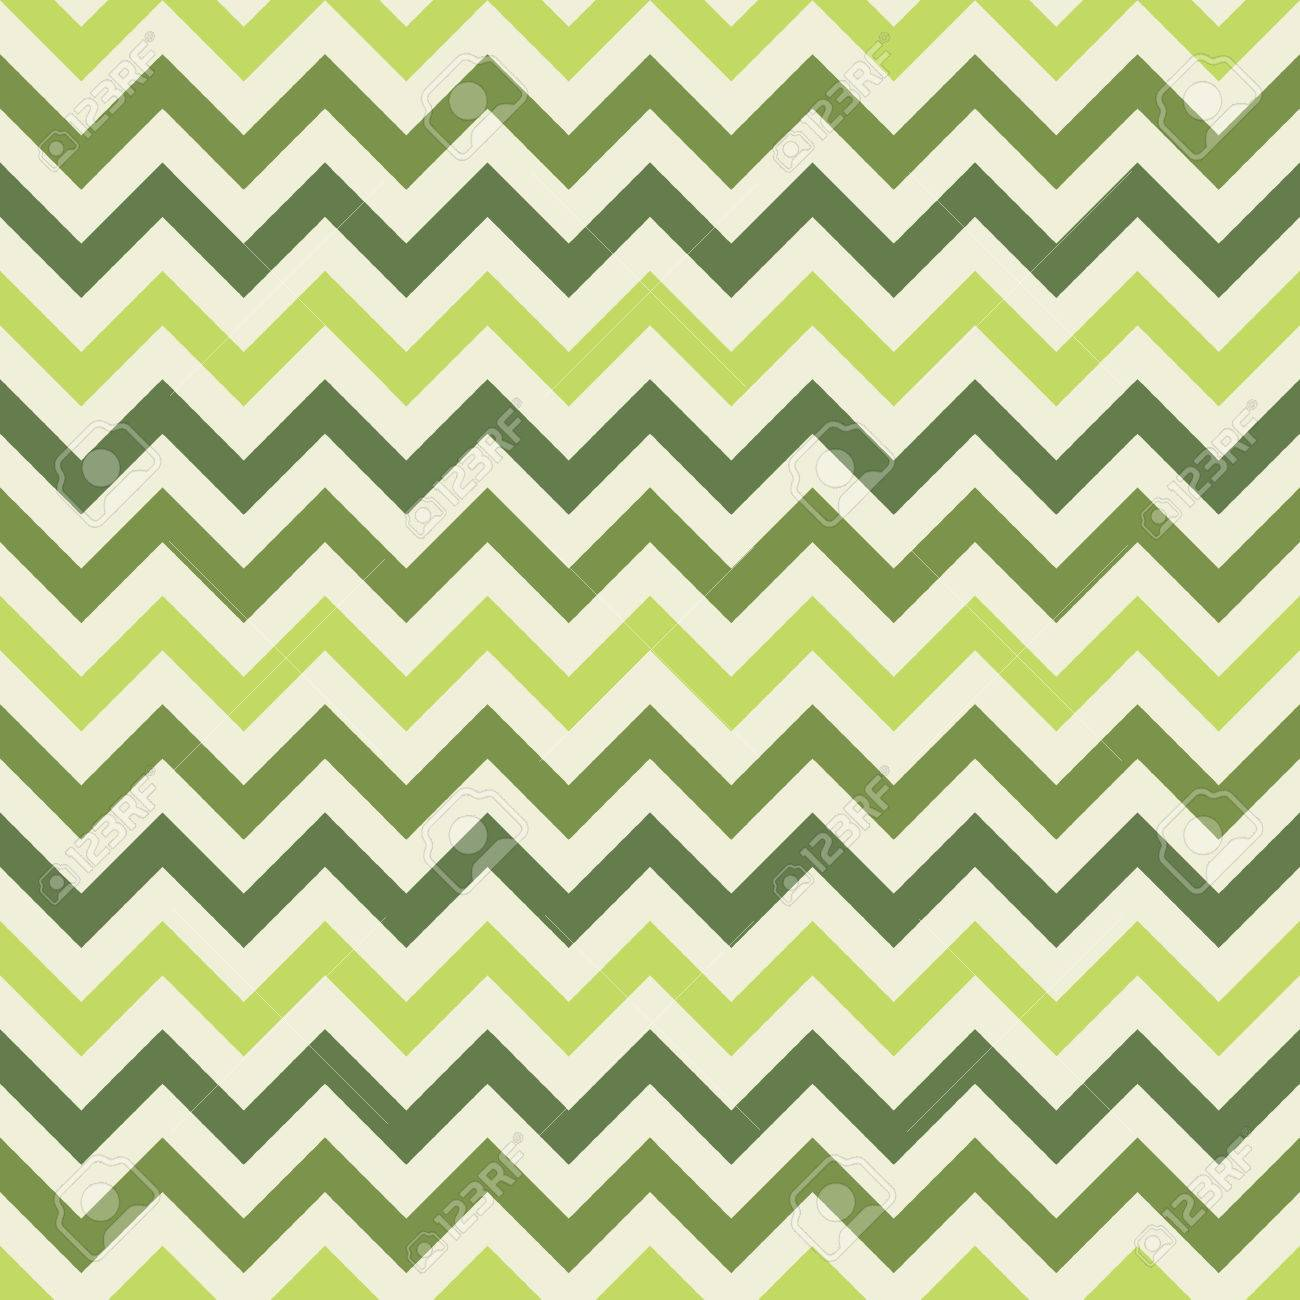 Green Retro Chevron Seamless Pattern - Vector Zig-zag Fabric ...